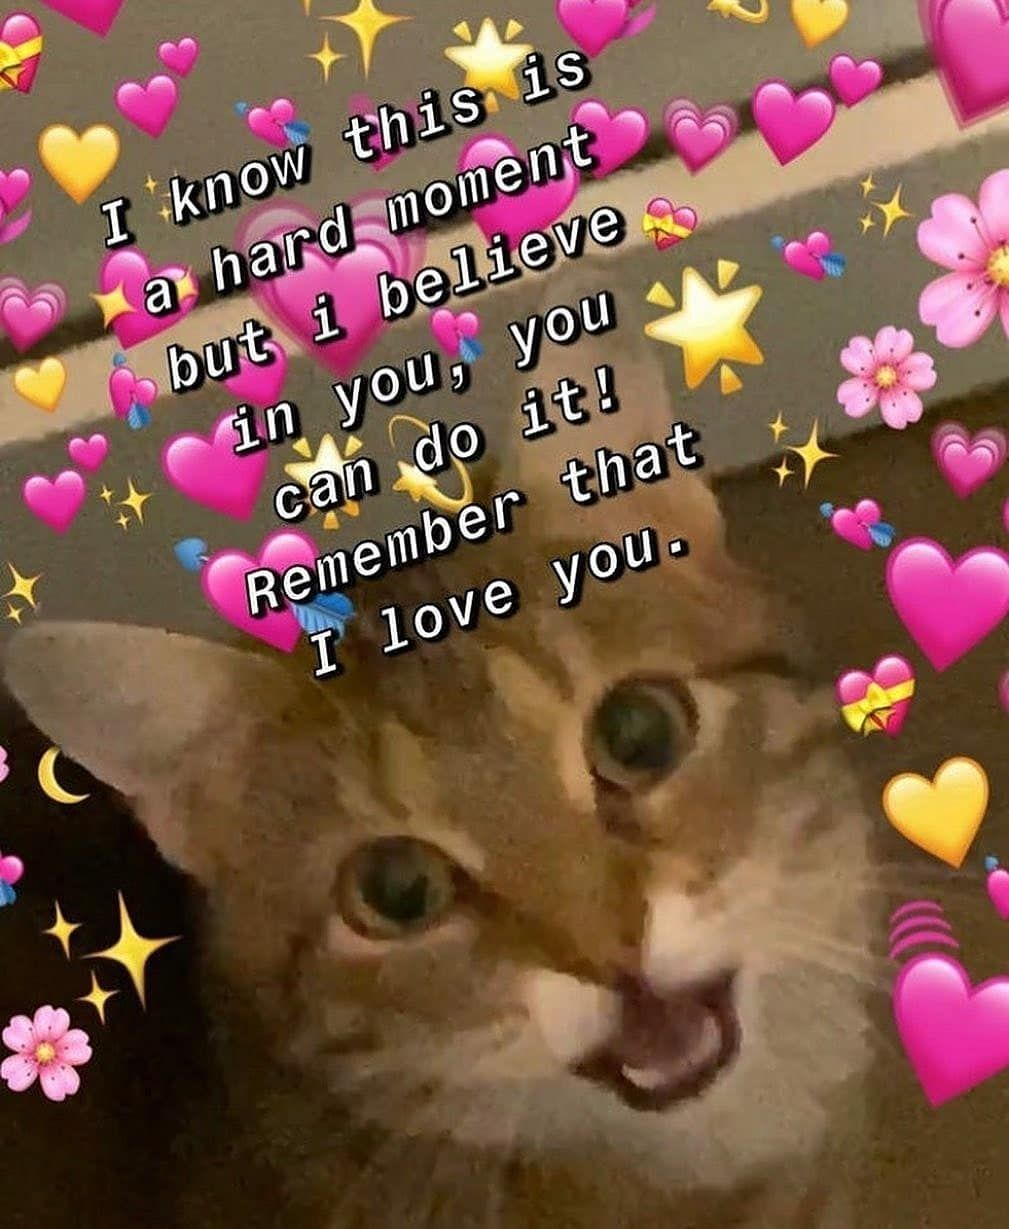 596 Curtidas 11 Comentarios Wholesome Memes Lovememesb No Instagram Love You All Tag Someone Cute Love Memes Love You Cute Love You Meme